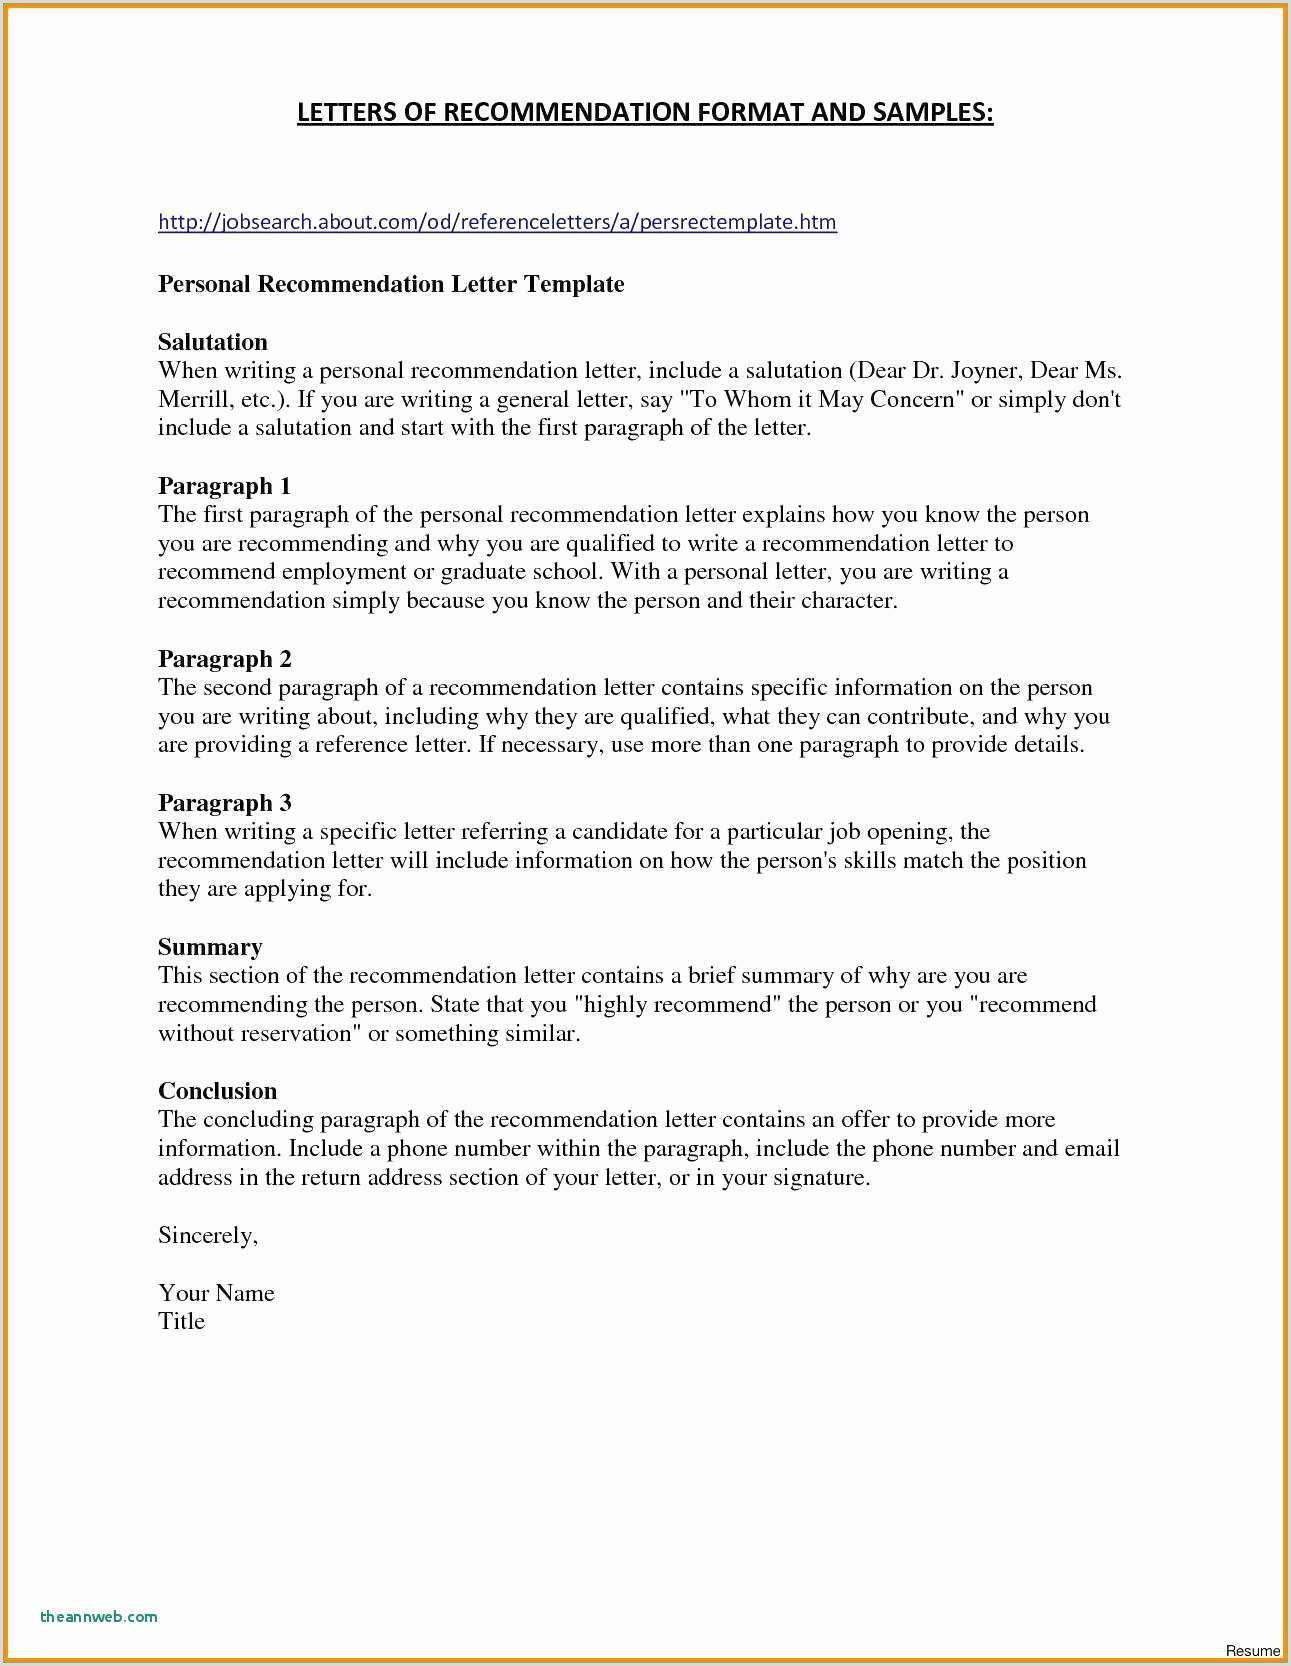 Resume format for Railway Jobs 10 Resume formats for Internships